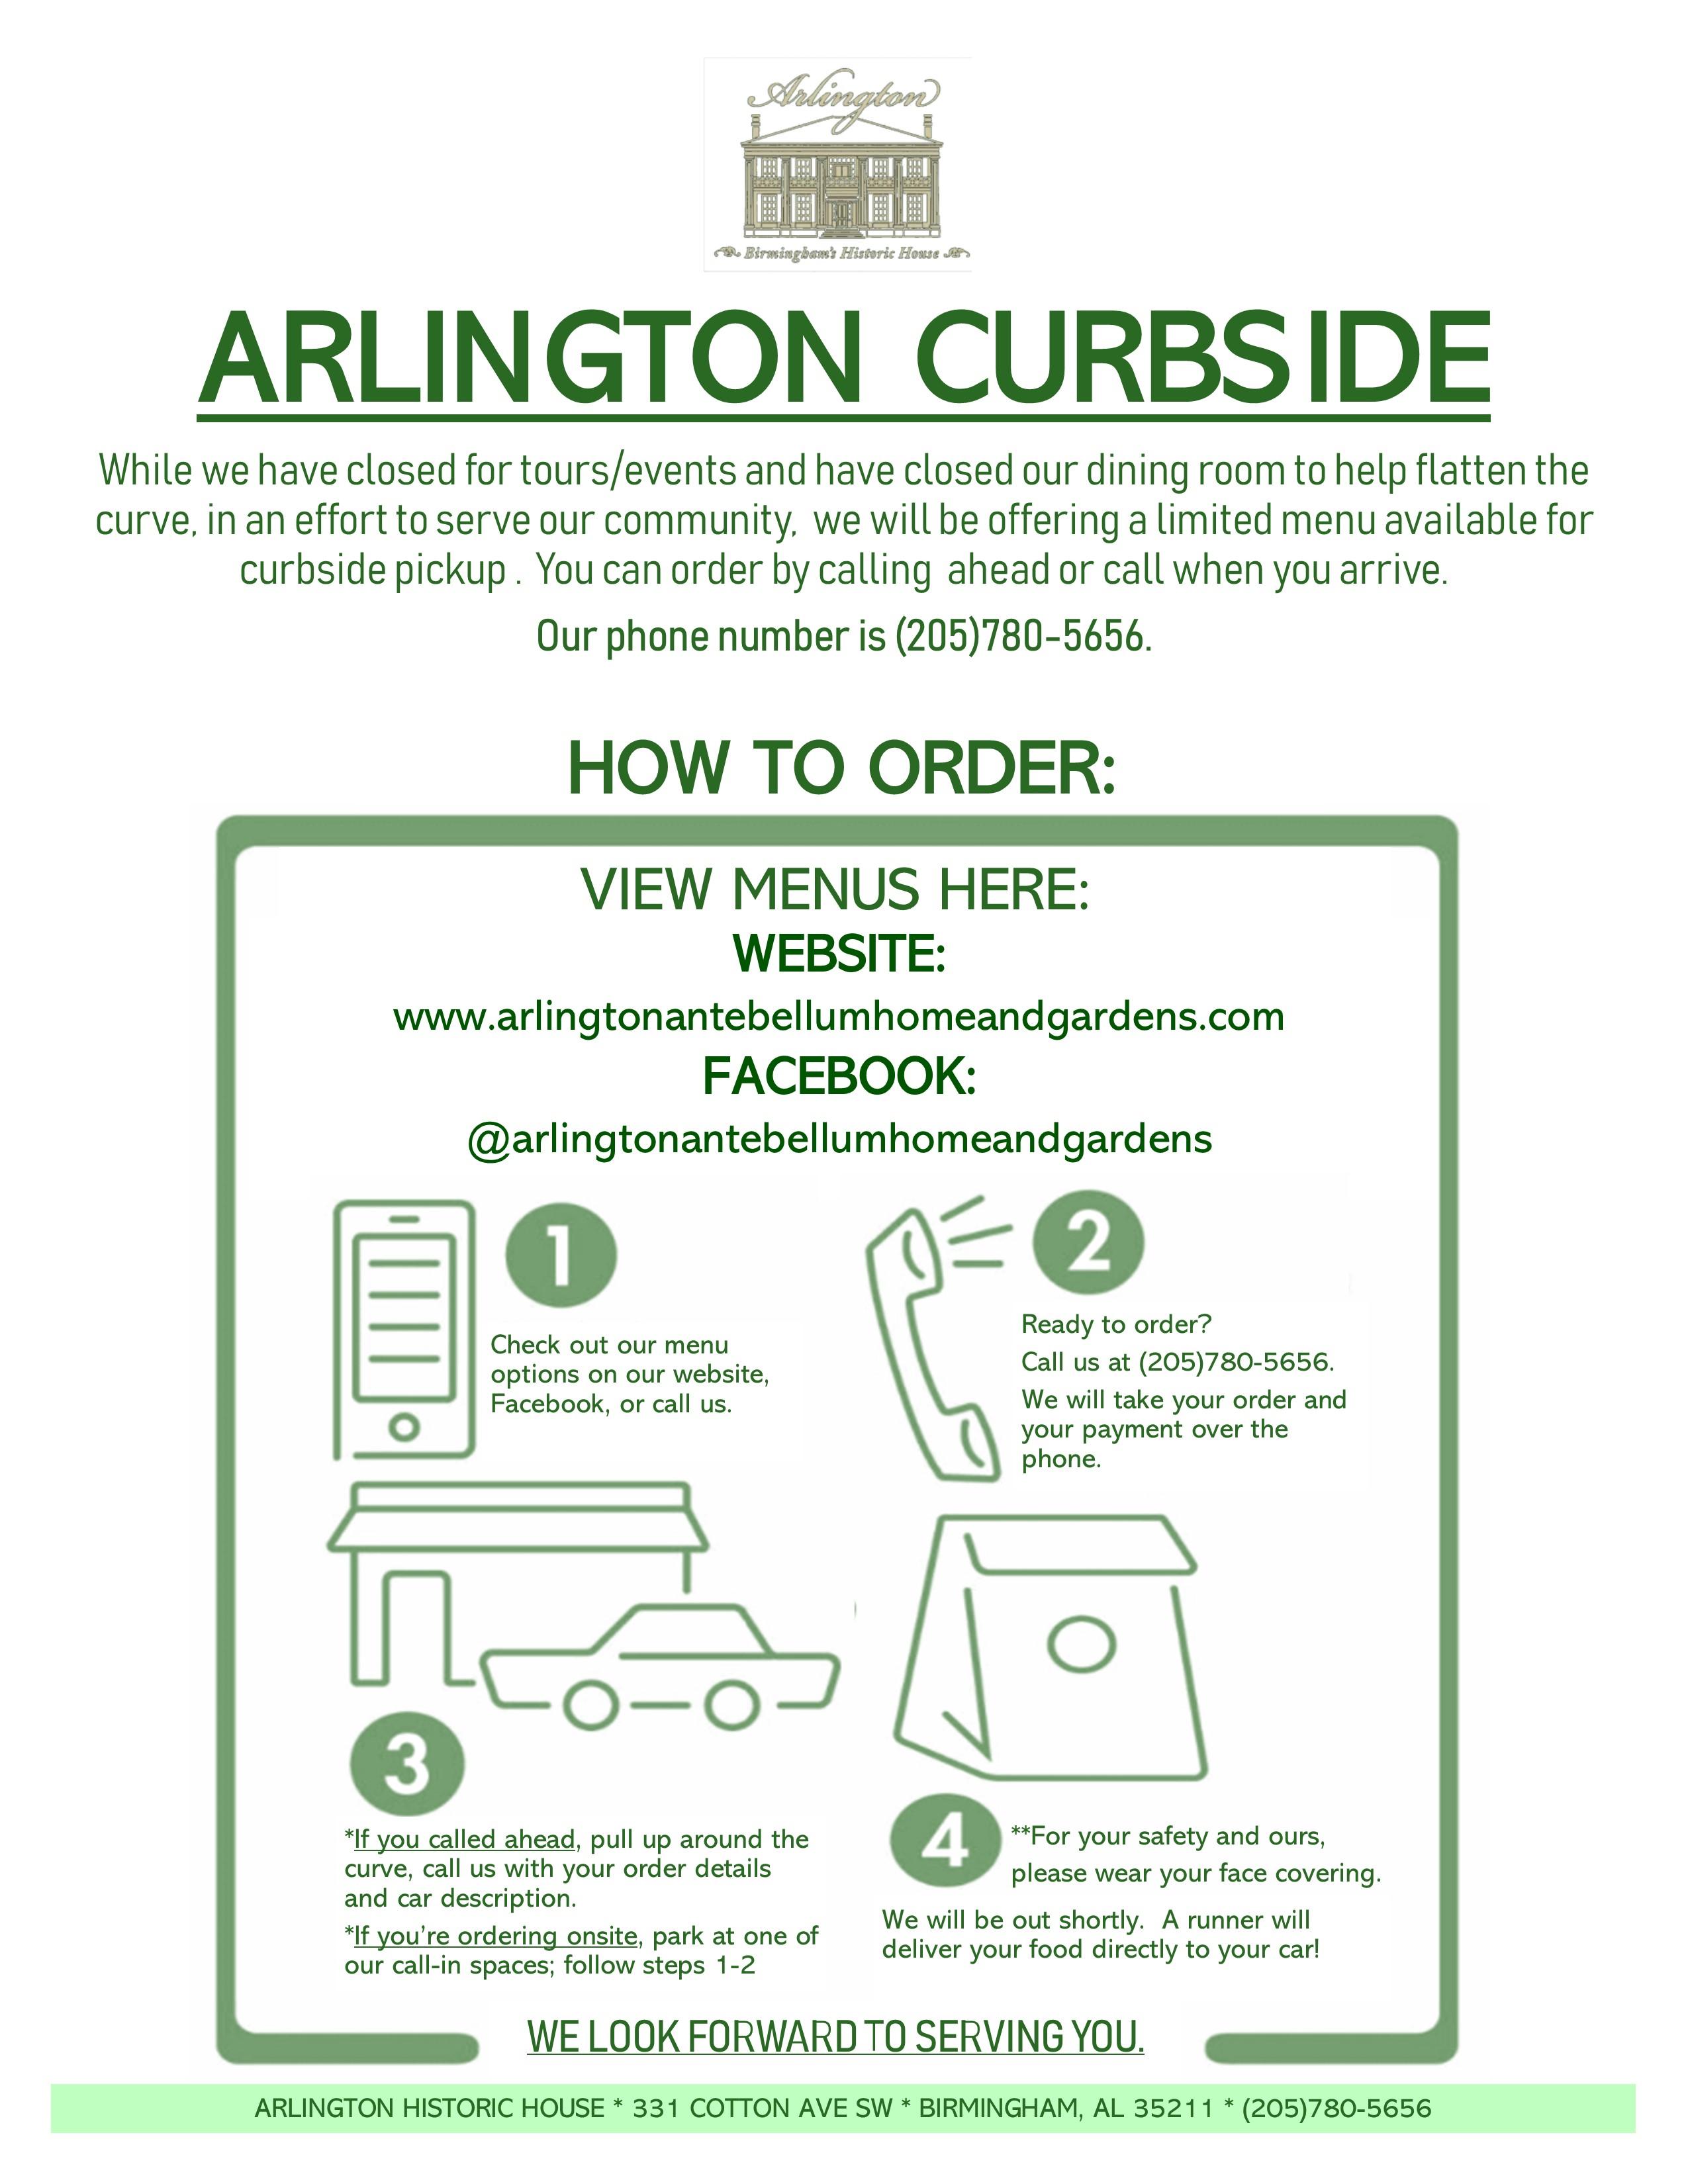 Arlington Christmas Weekend 2020 Birmingham Al Summer at Arlington   The Official Website for the City of